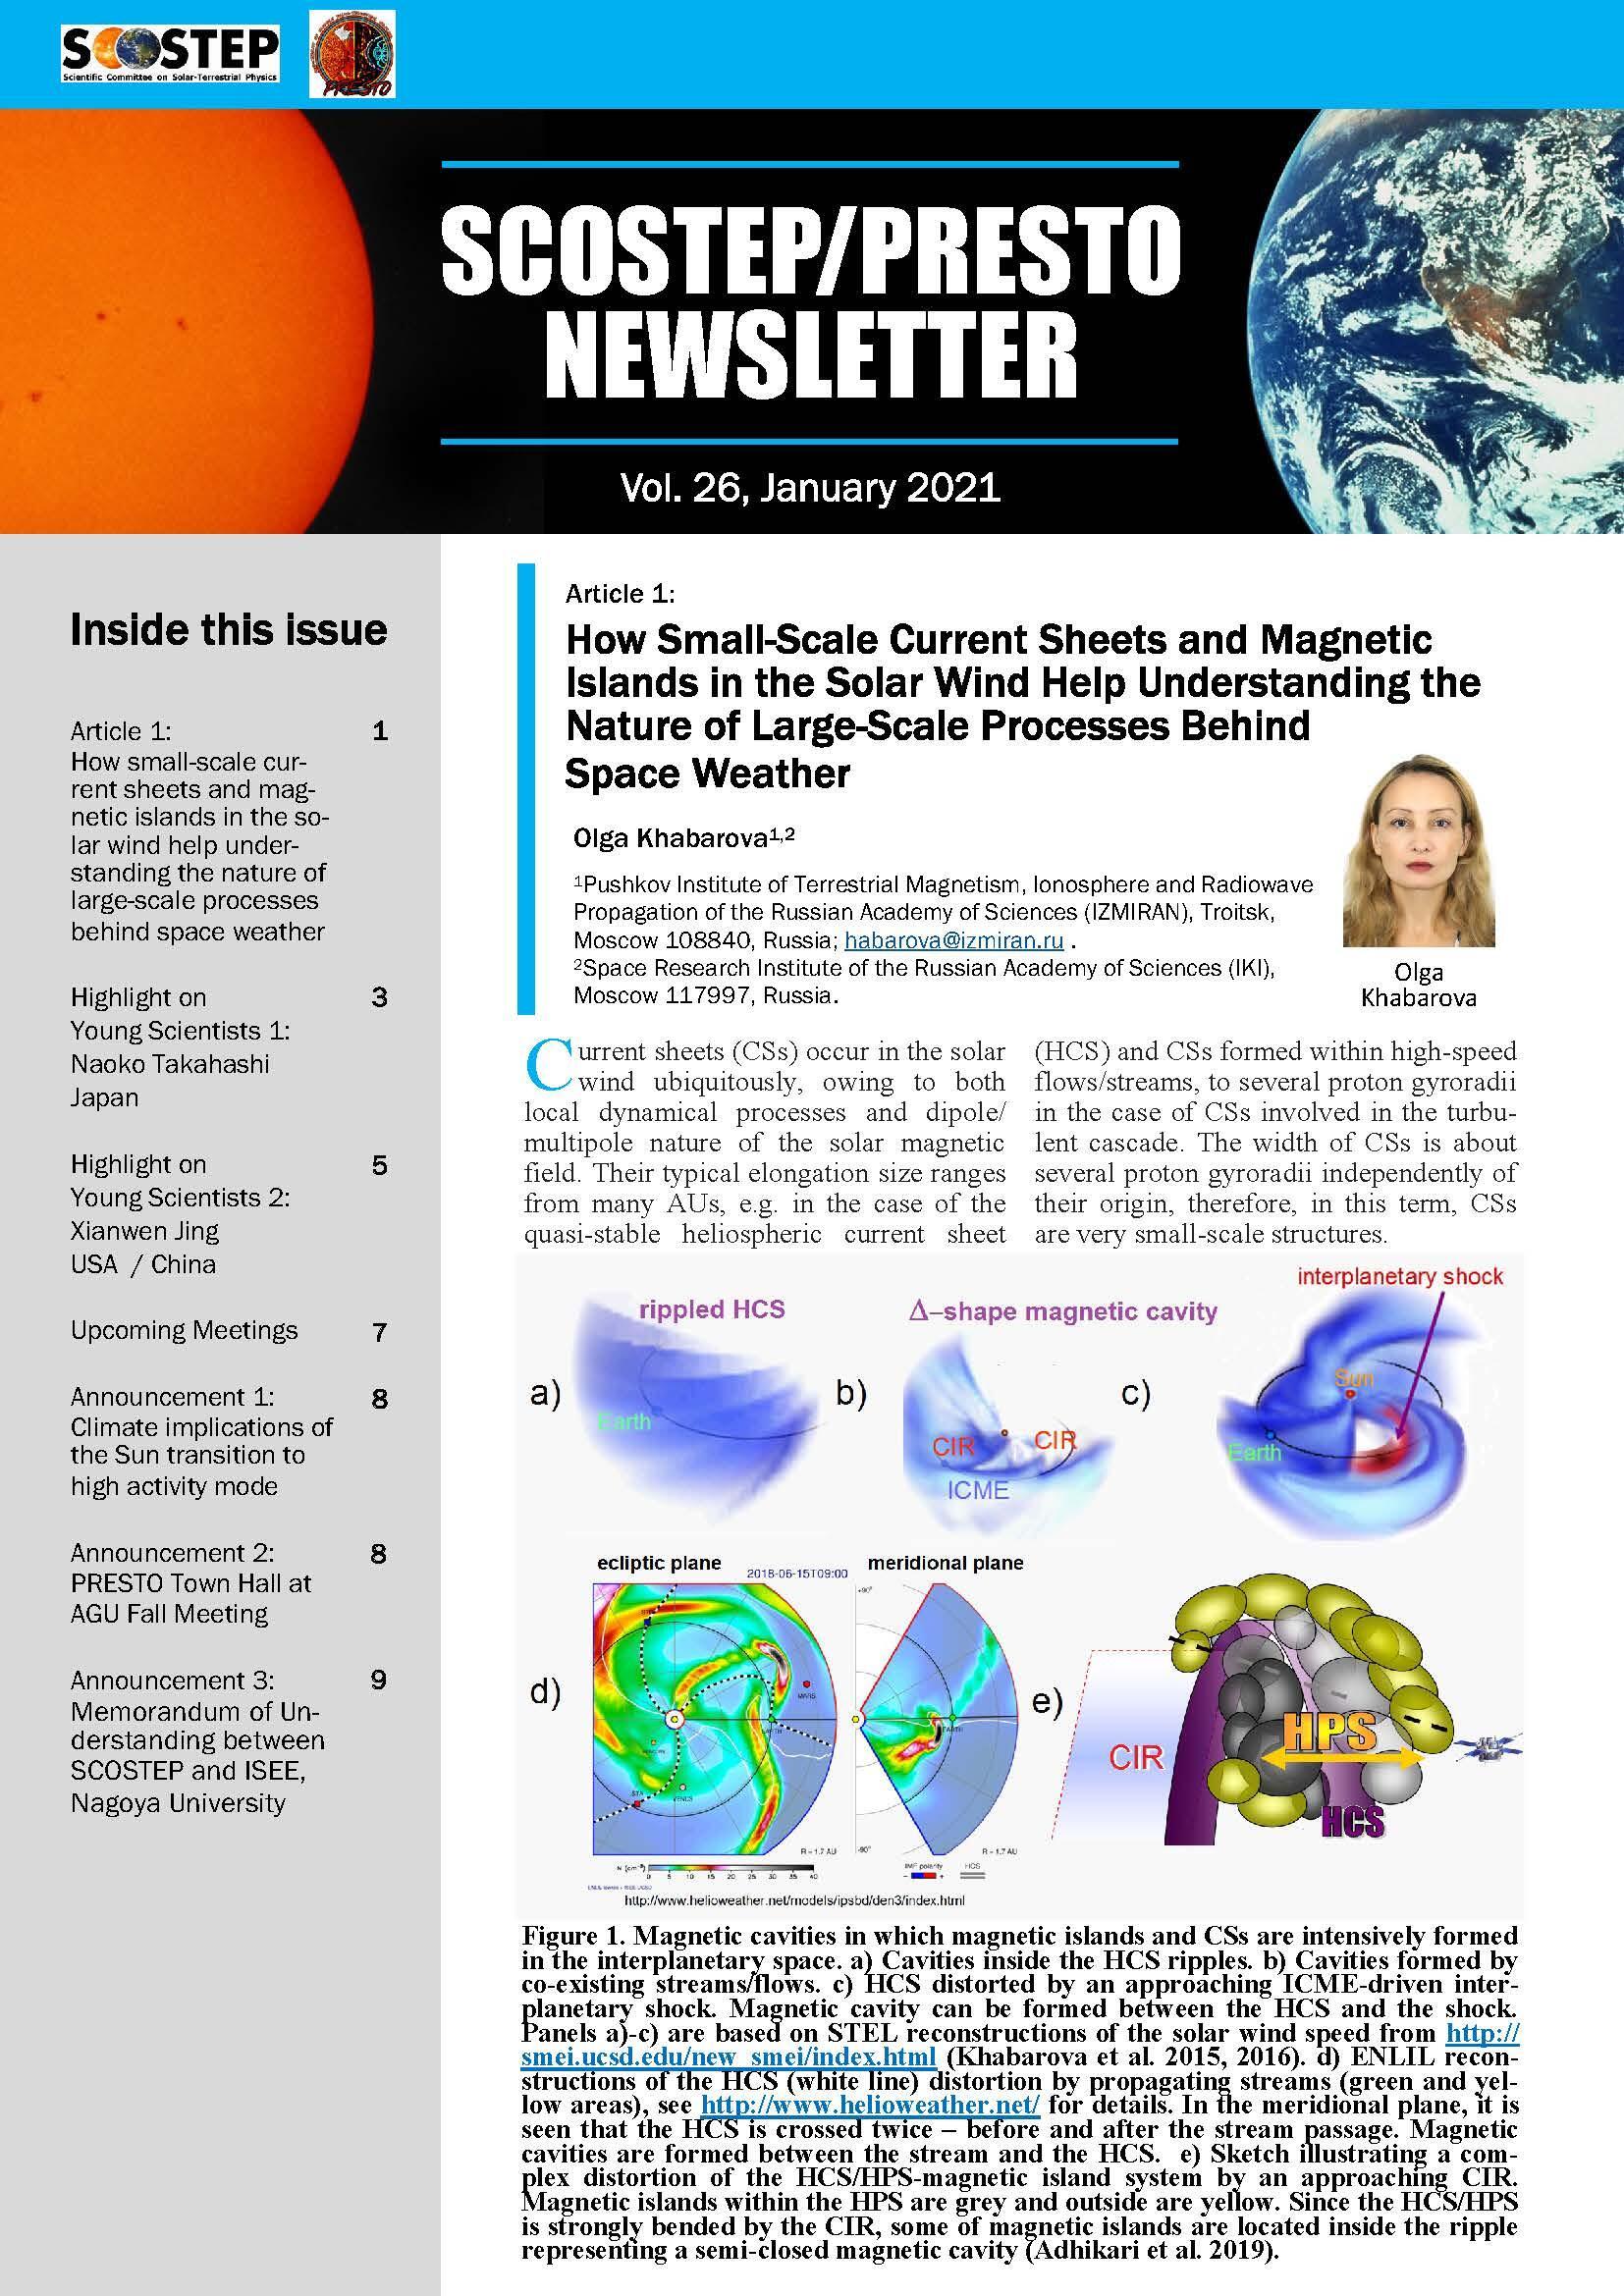 SCOSTEP_PRESTO_Newsletter_Vol26_high_reso_01.jpg